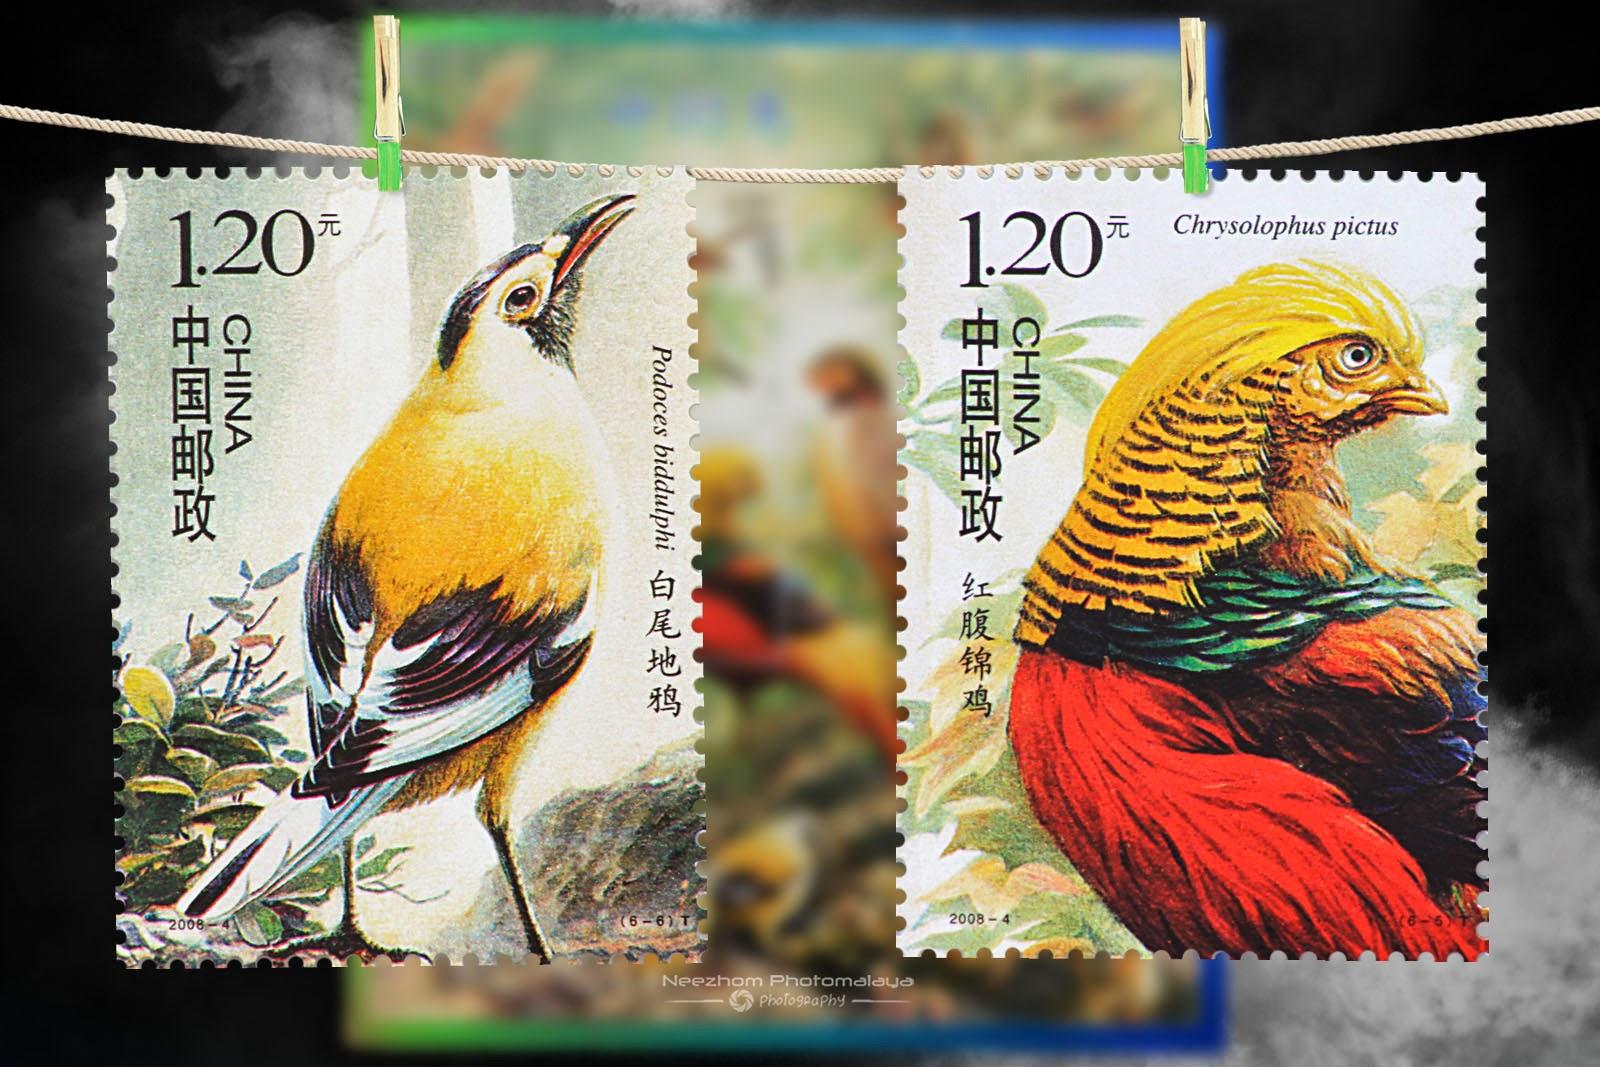 2008 Birds of China stamps - Podoces biddulphi 120 Fen, Chrysolophus pictus 120 Fen